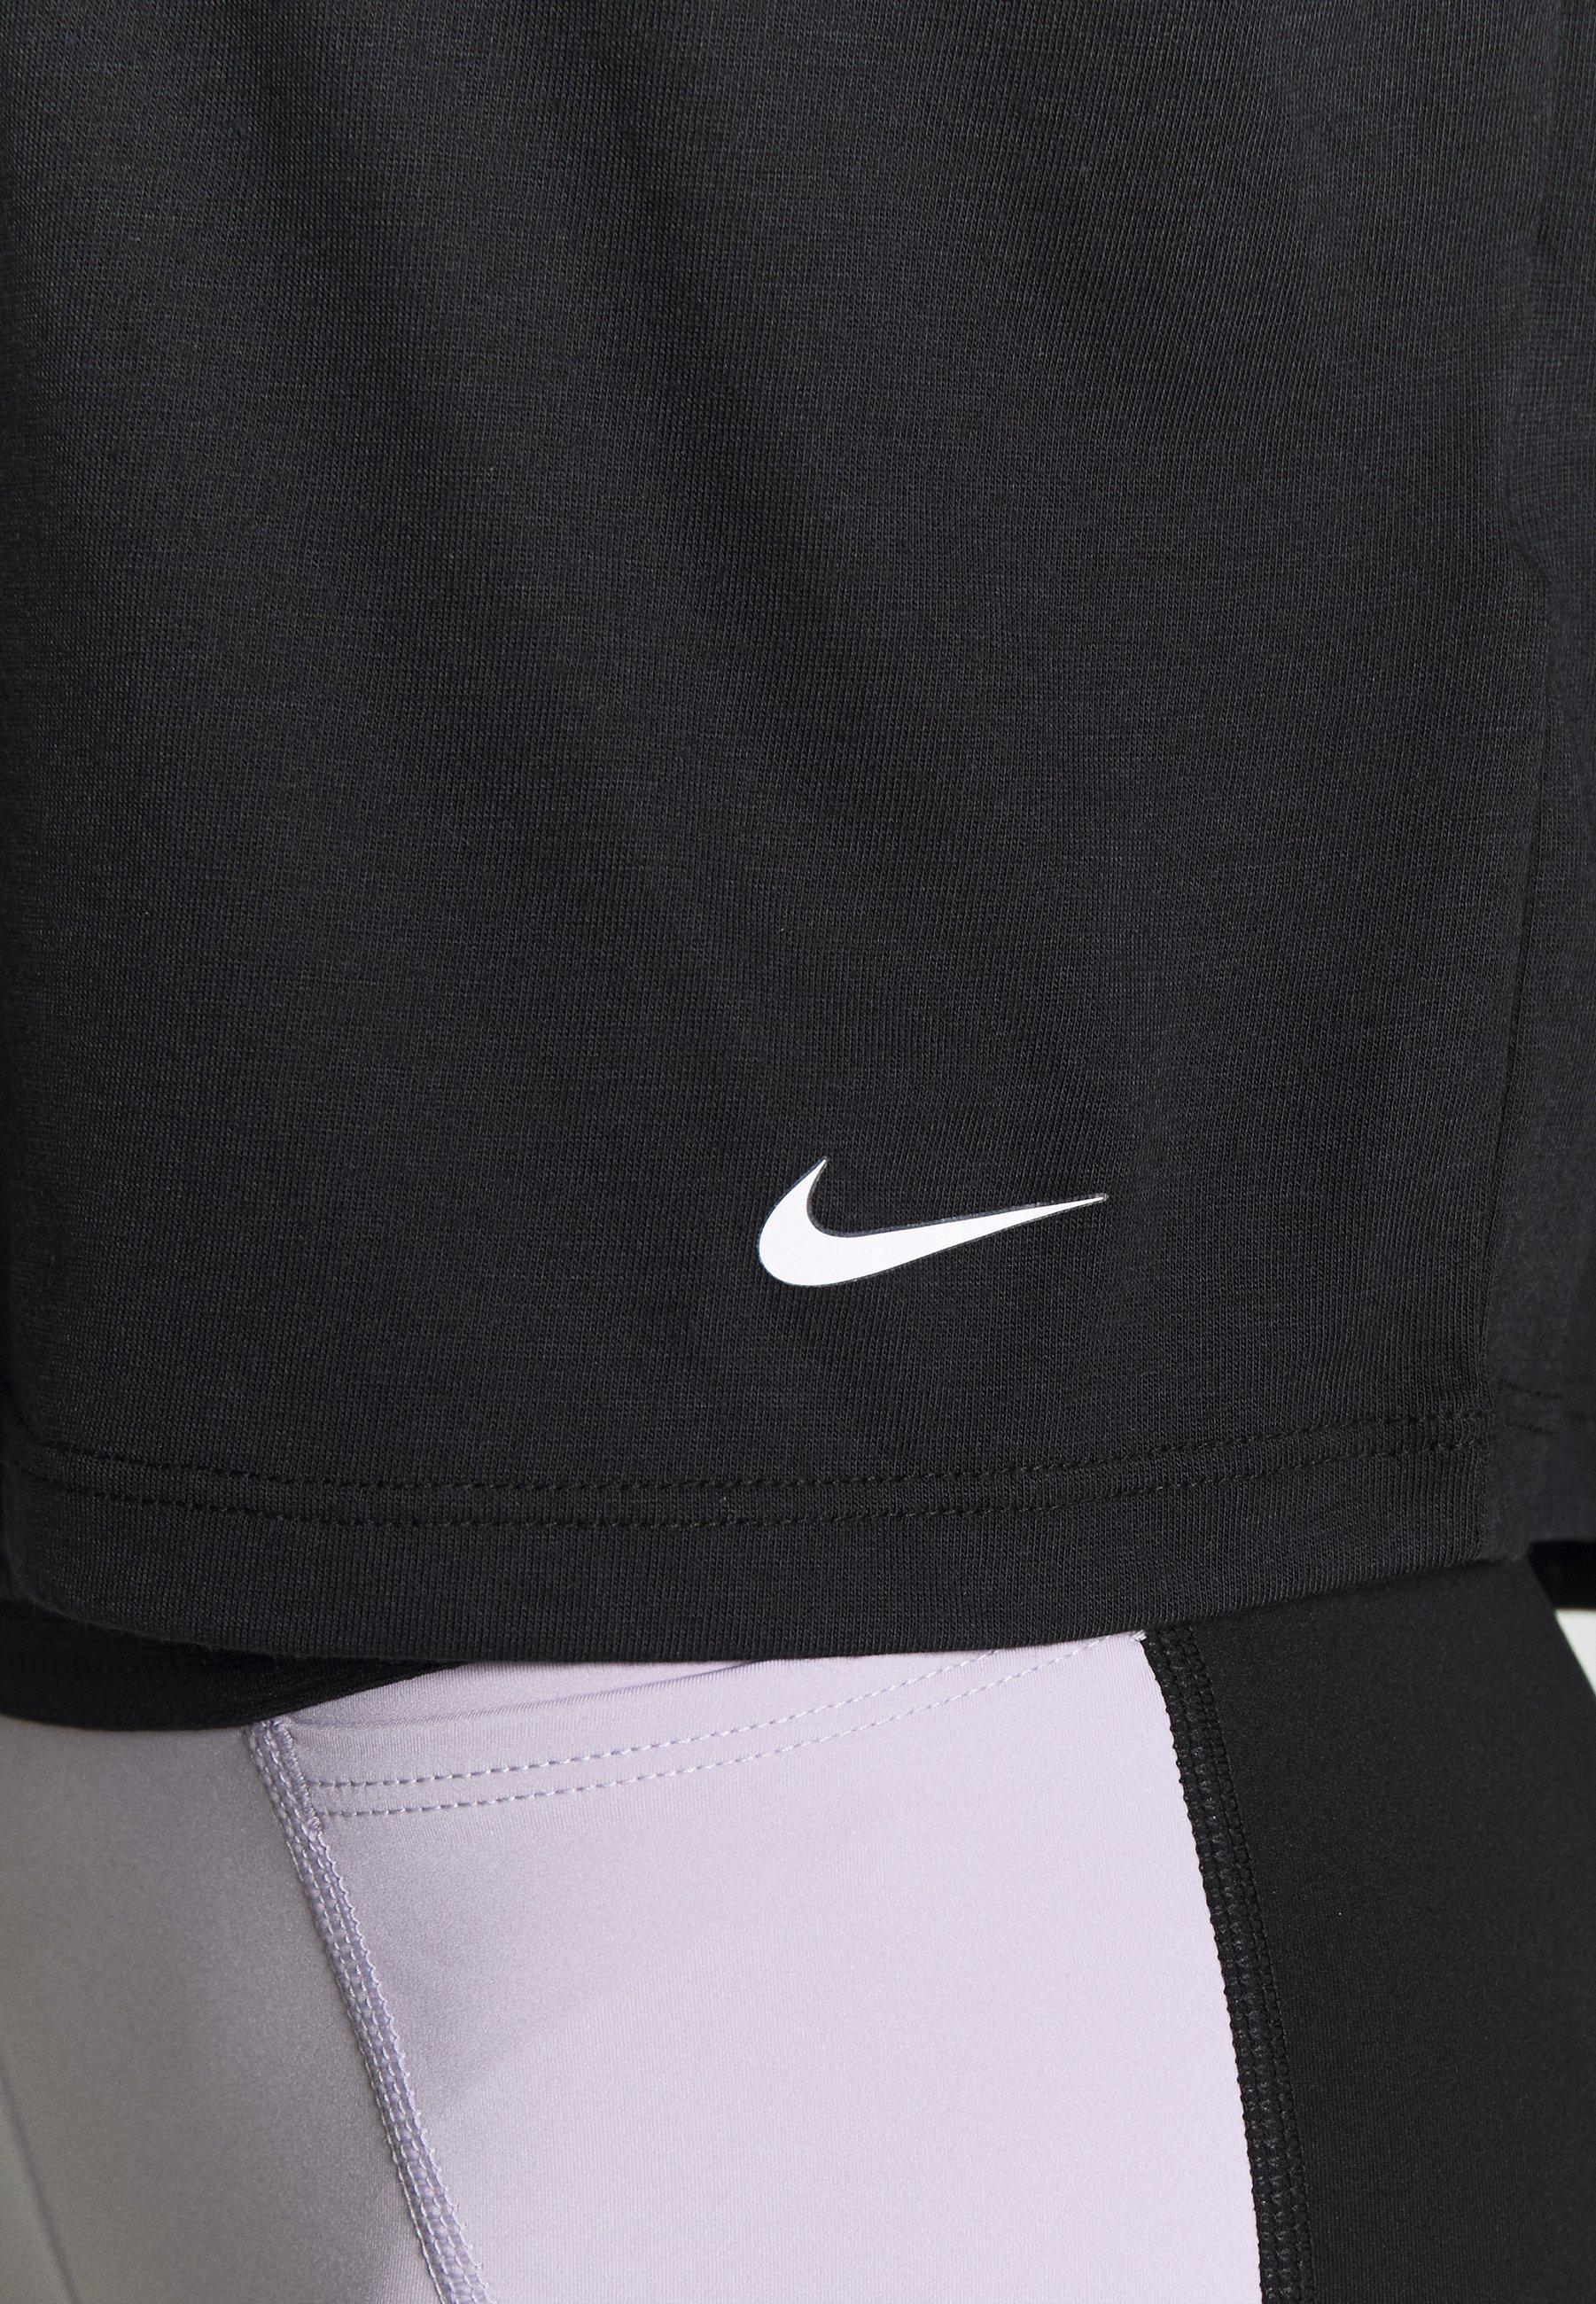 Nike Performance Print T-shirt - black/white Kpadh